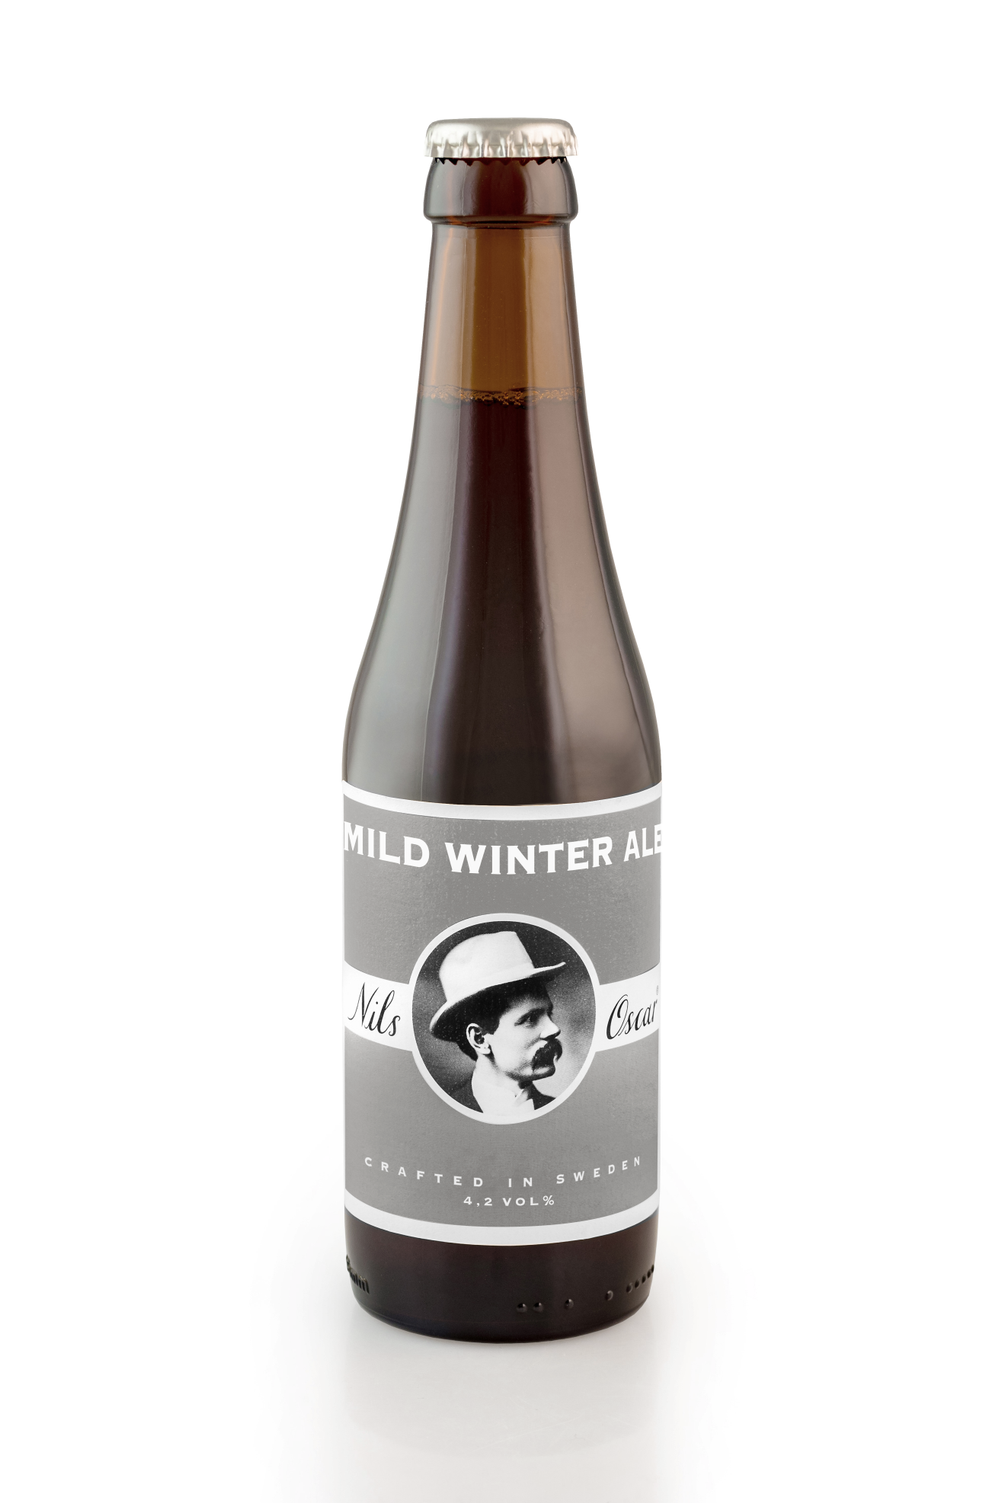 Nils Oscar Mild Winter Ale